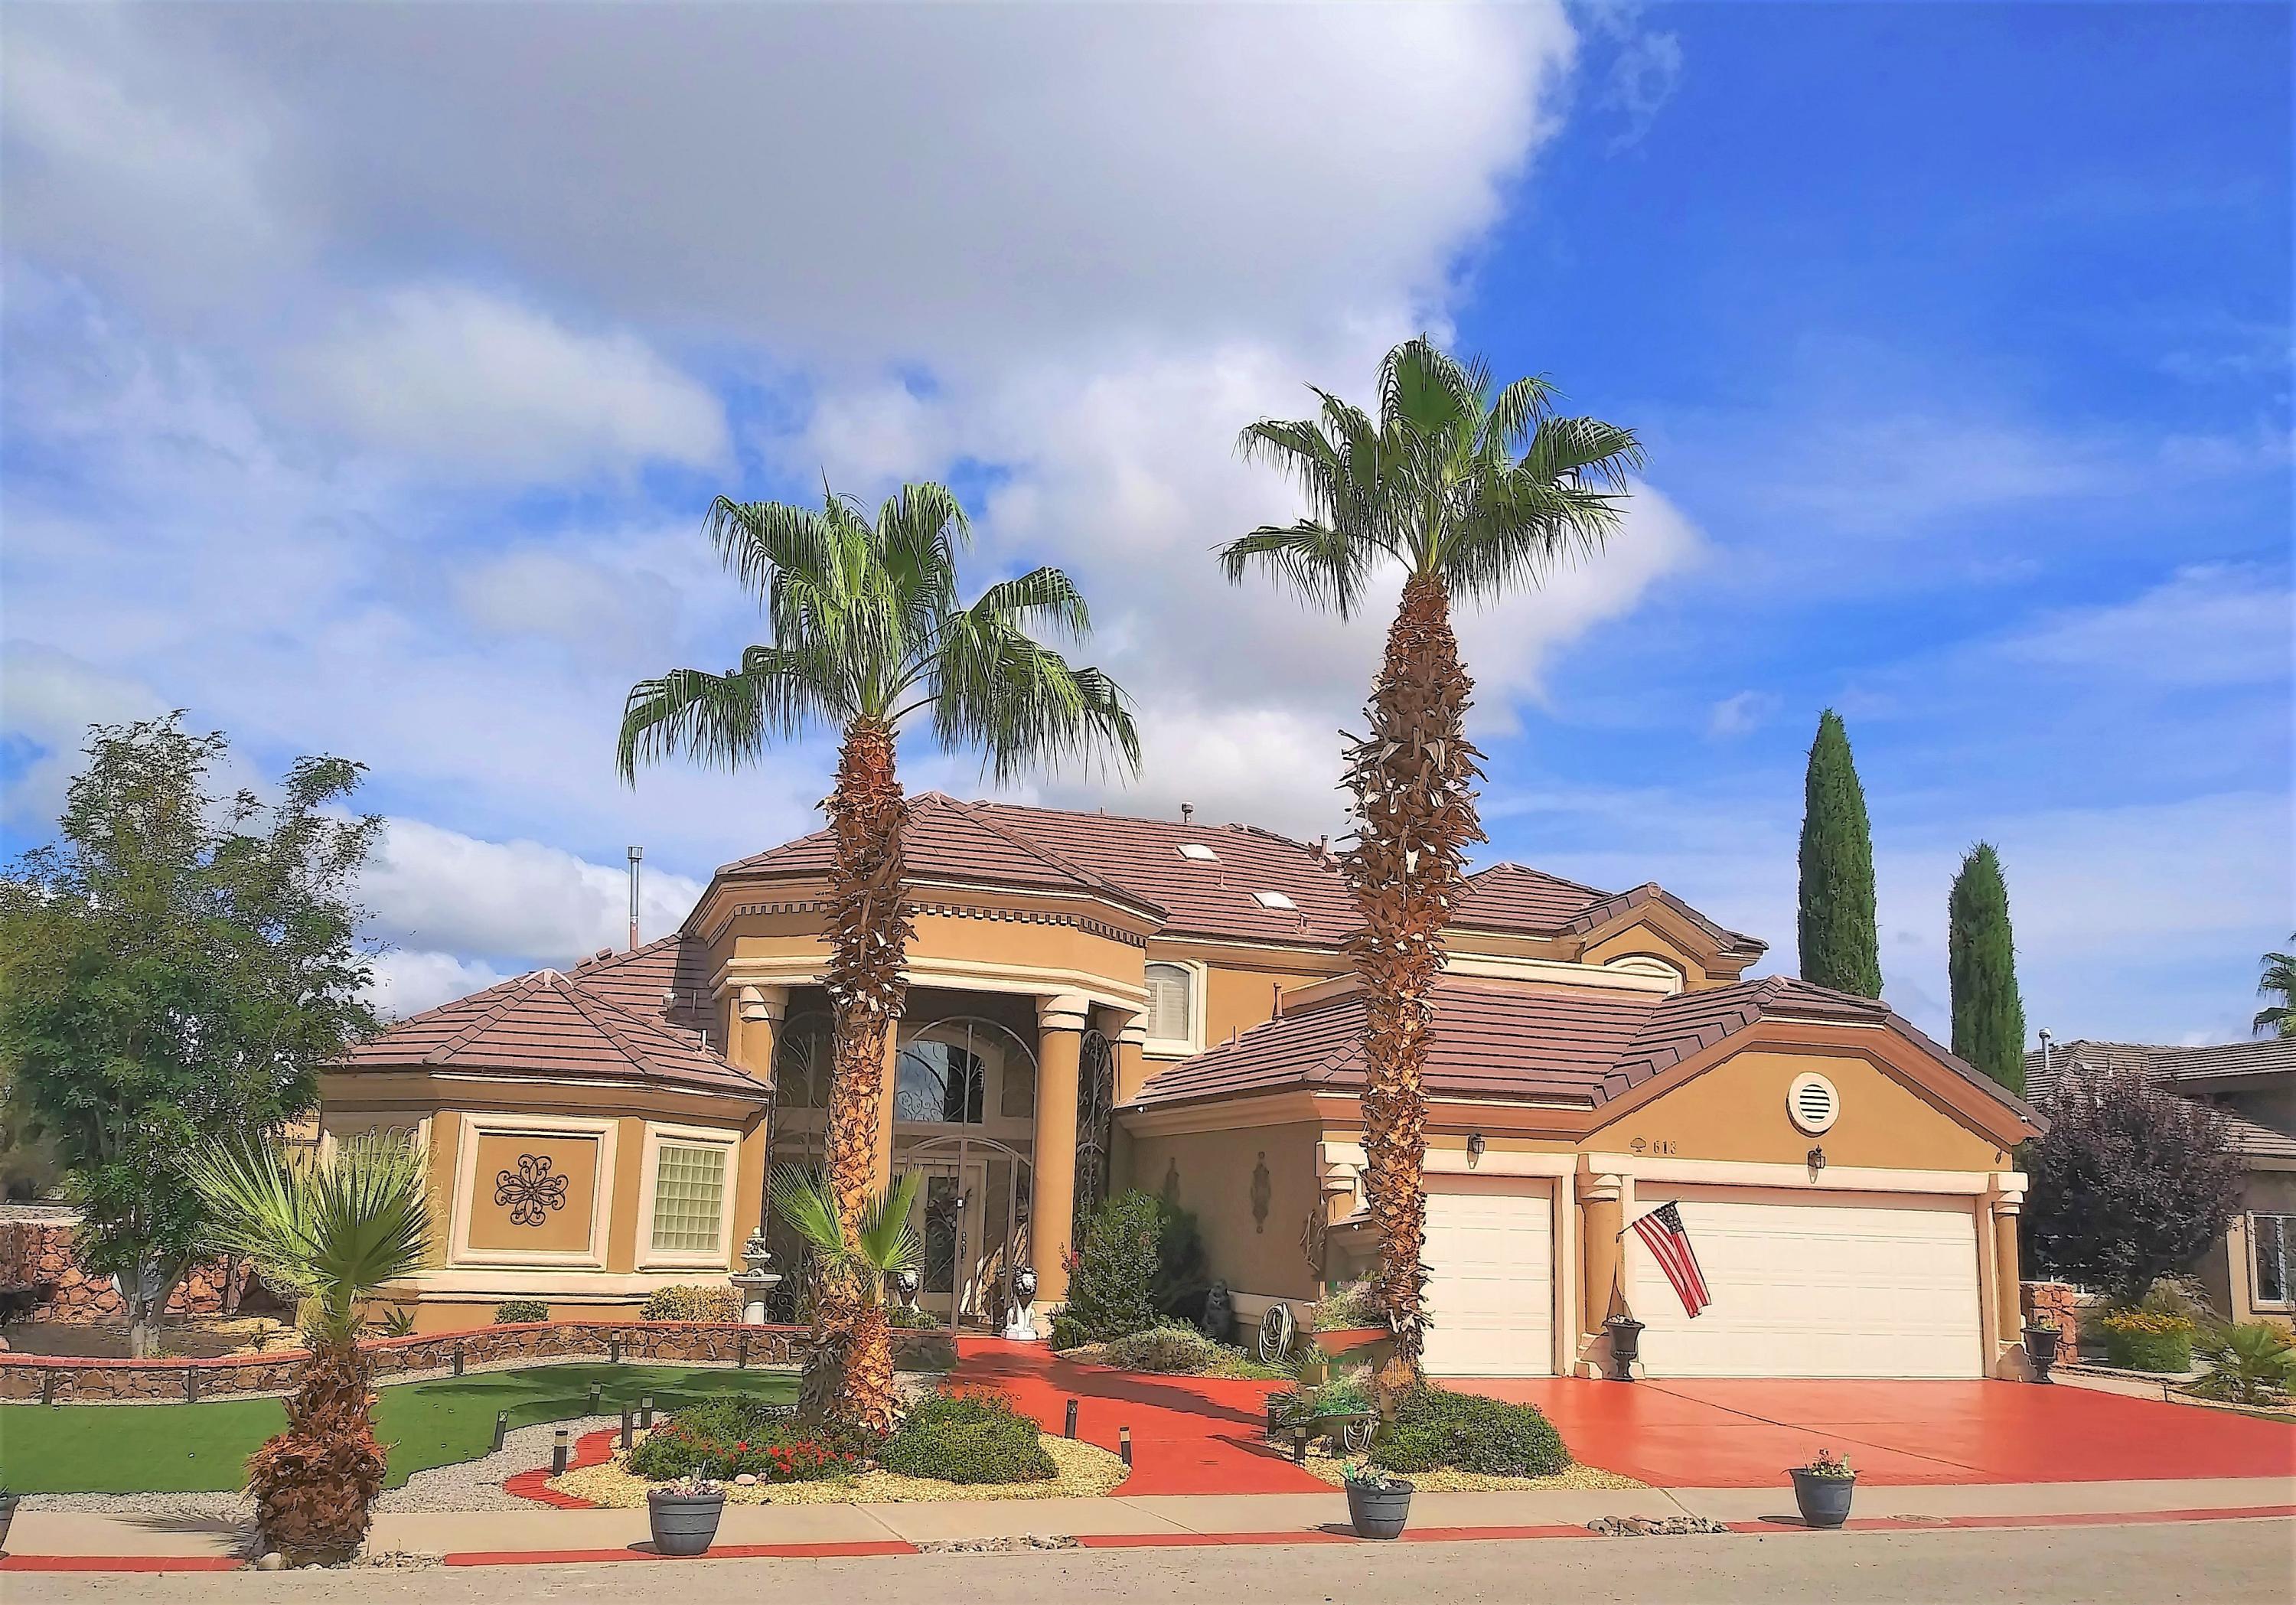 613 CINNAMON TEAL, El Paso, Texas 79932, 5 Bedrooms Bedrooms, ,5 BathroomsBathrooms,Residential,For sale,CINNAMON TEAL,822968